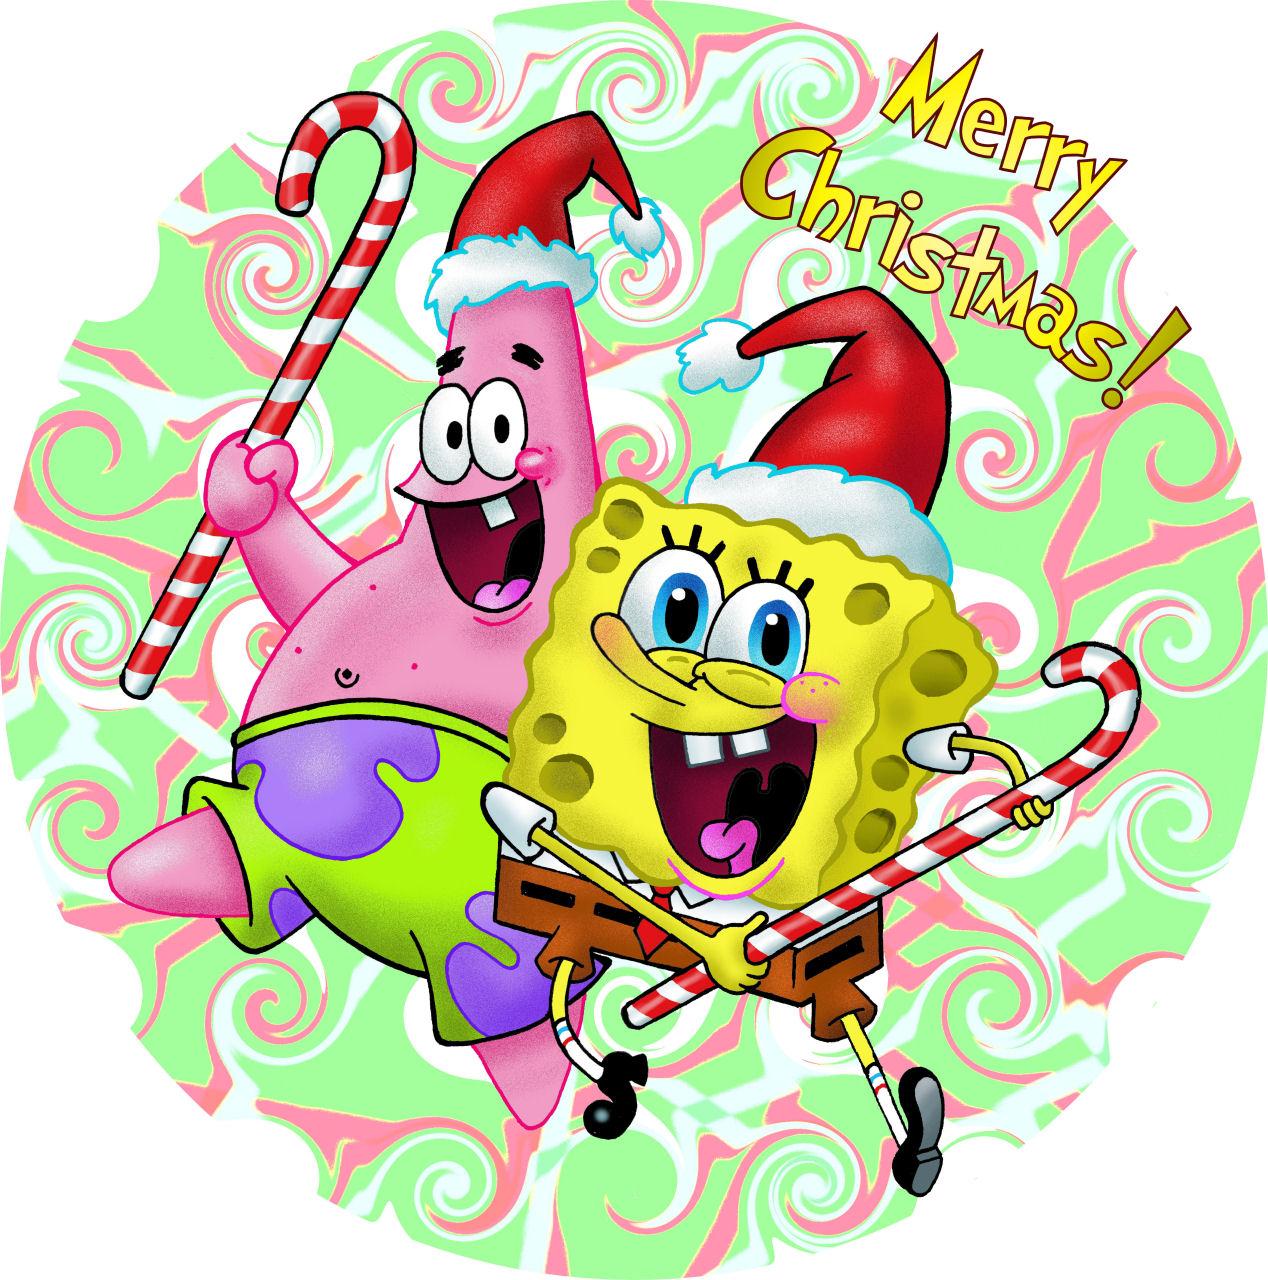 Spongebob Christmas.A Spongebob Christmas By Gjones1 On Deviantart